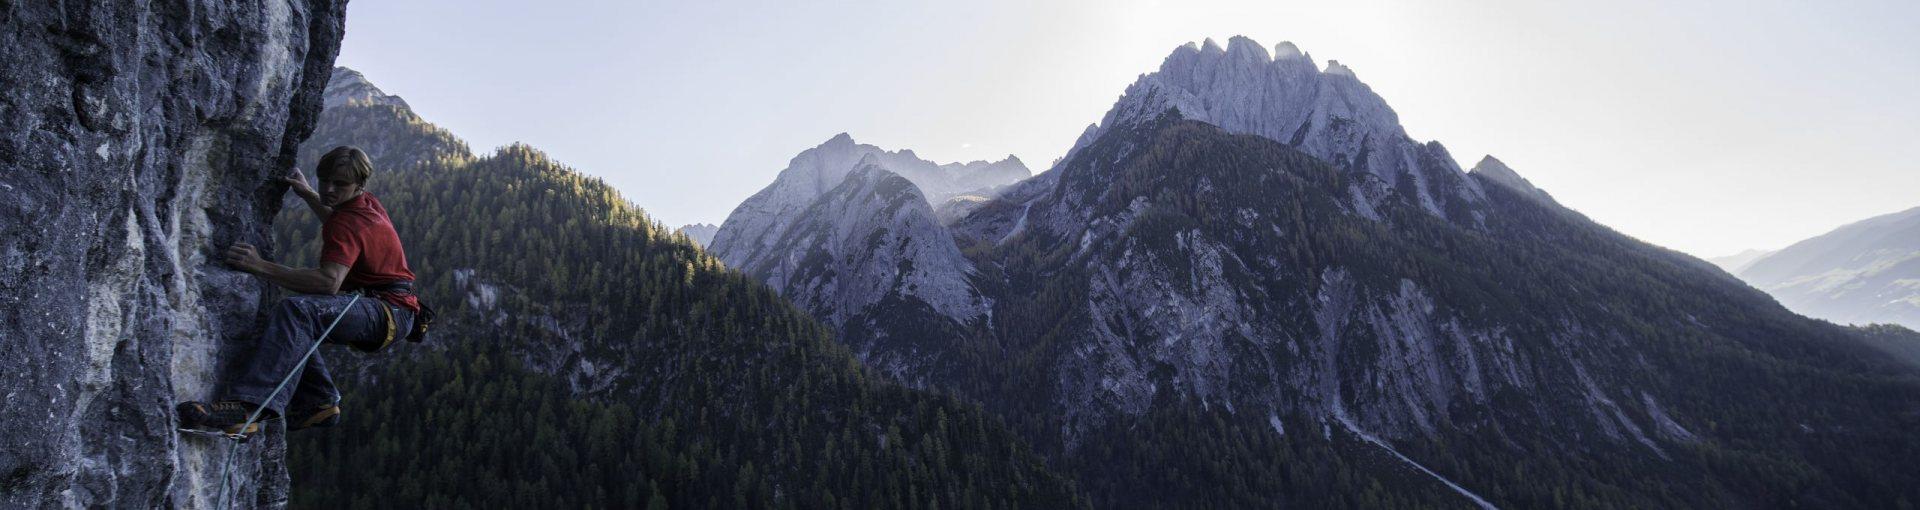 Klettern Osttirol © Tirol Werbung